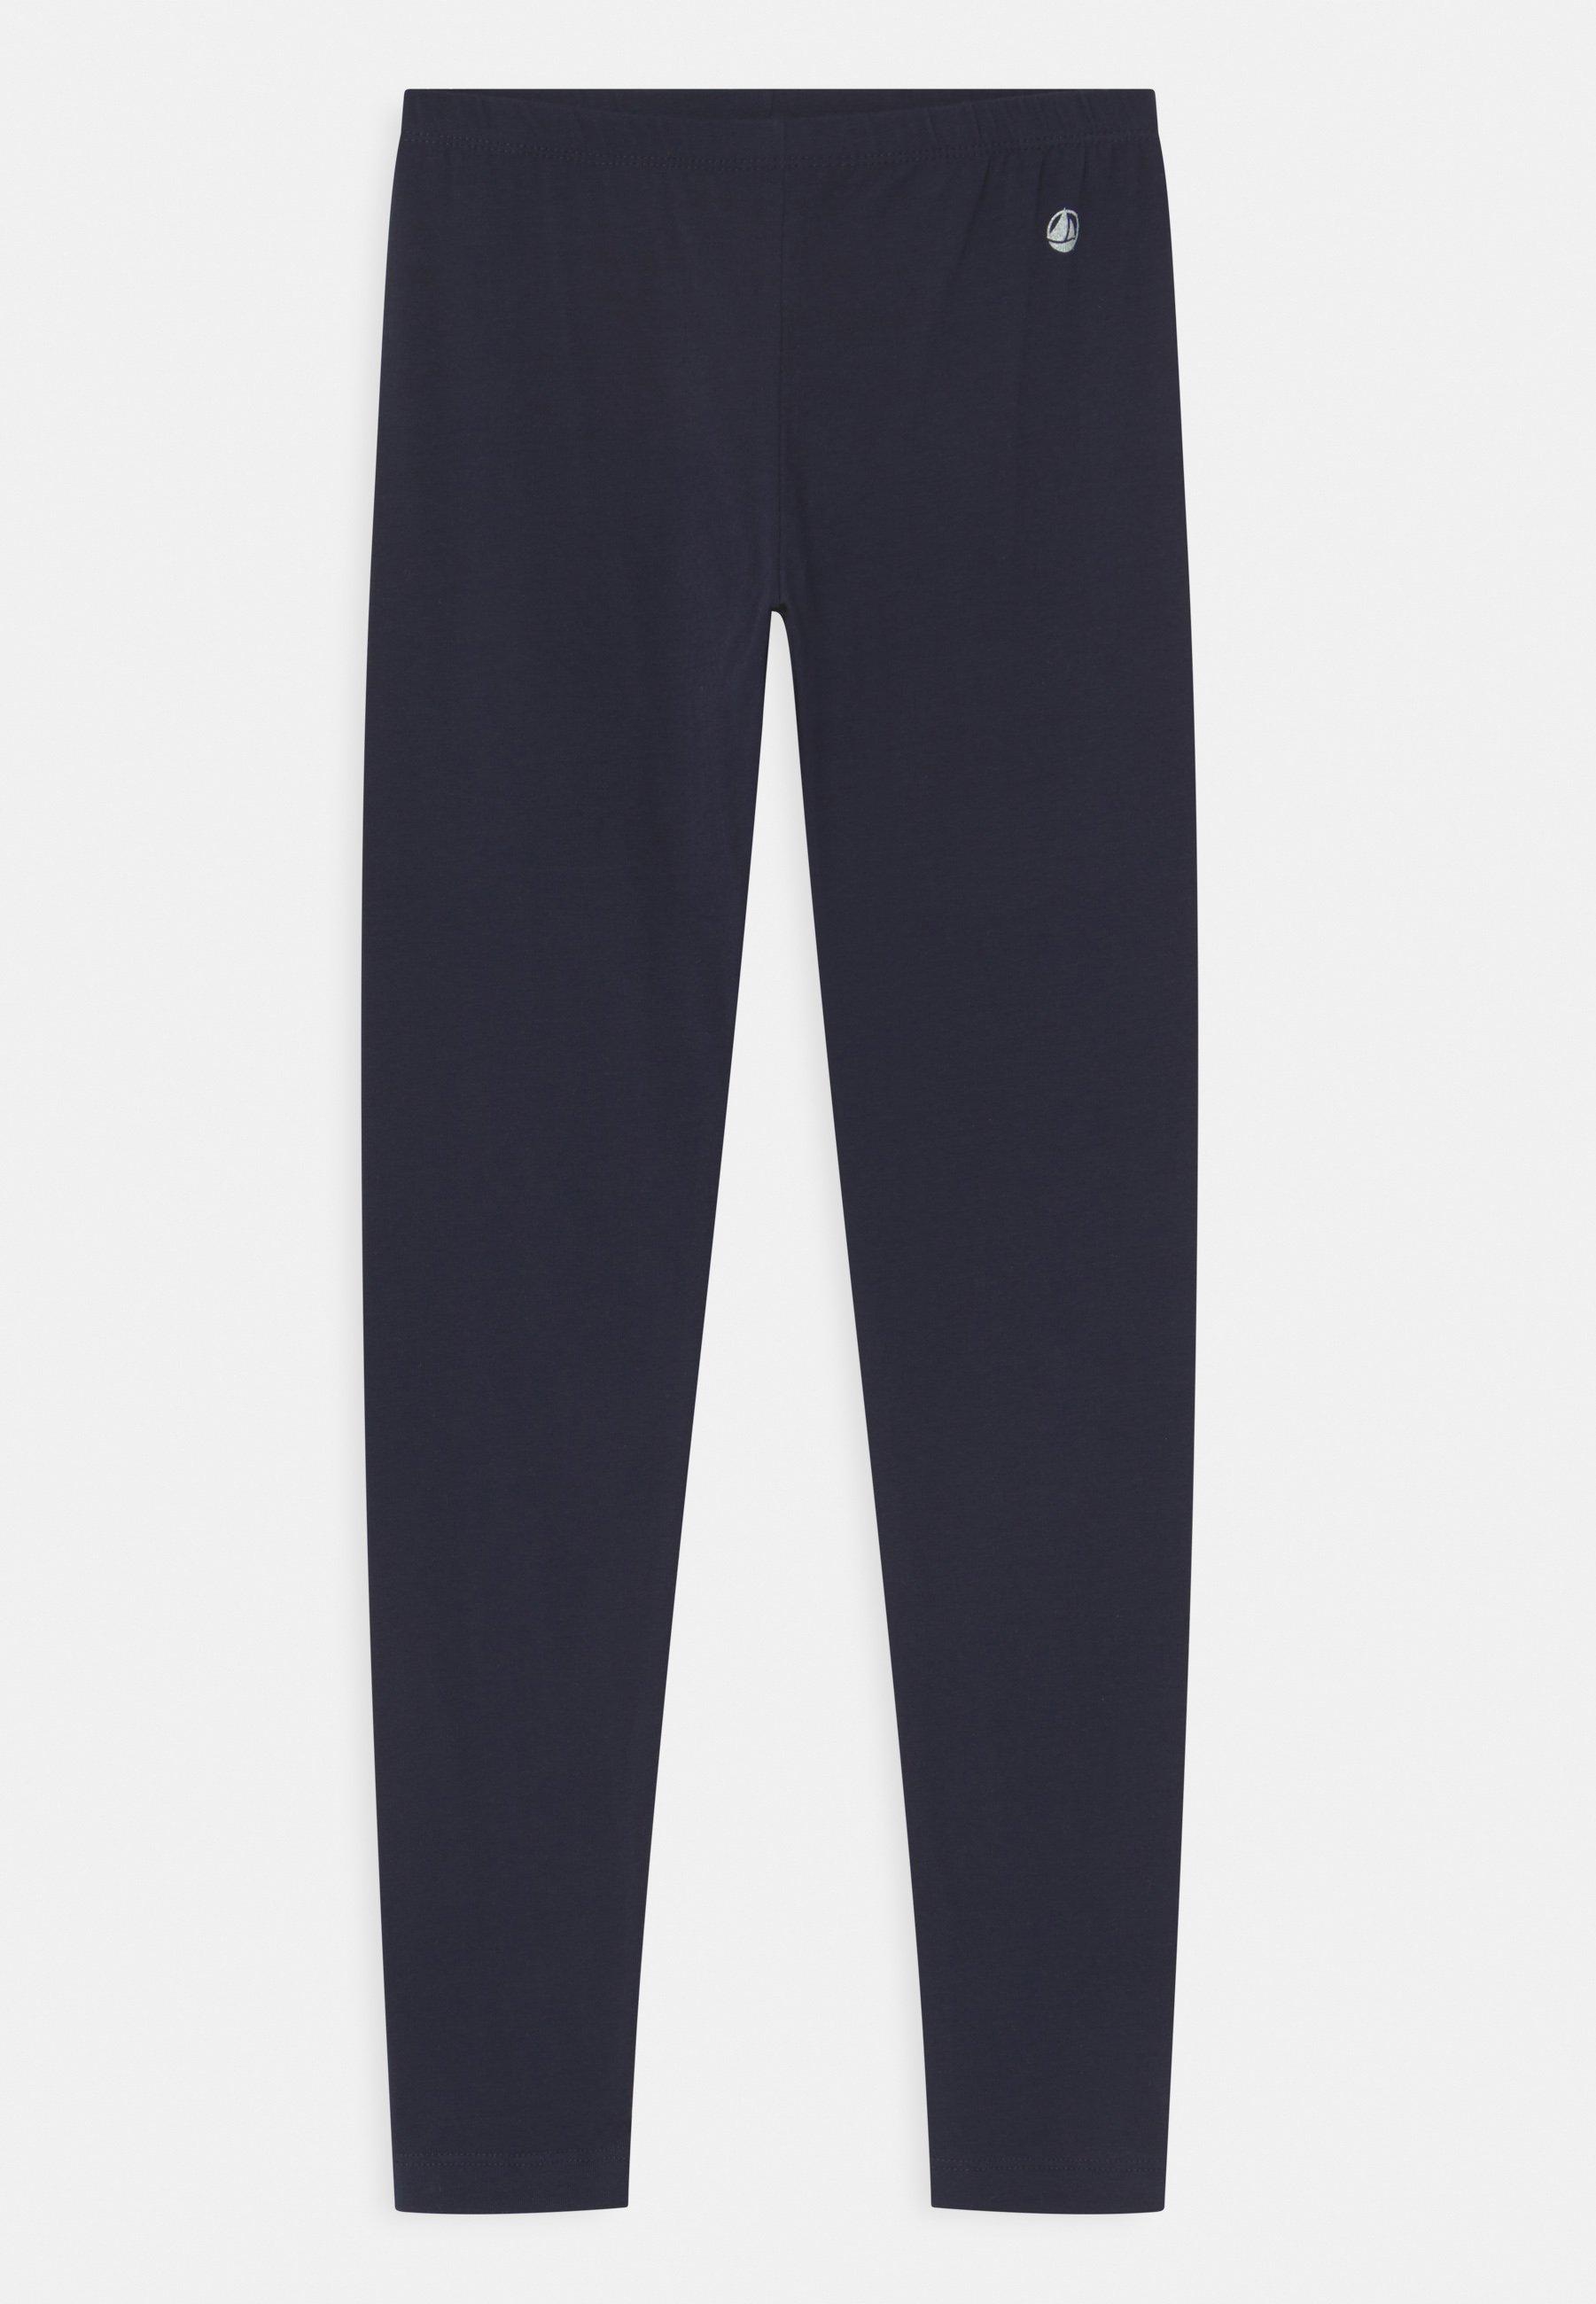 Kids FUNEO - Leggings - Trousers